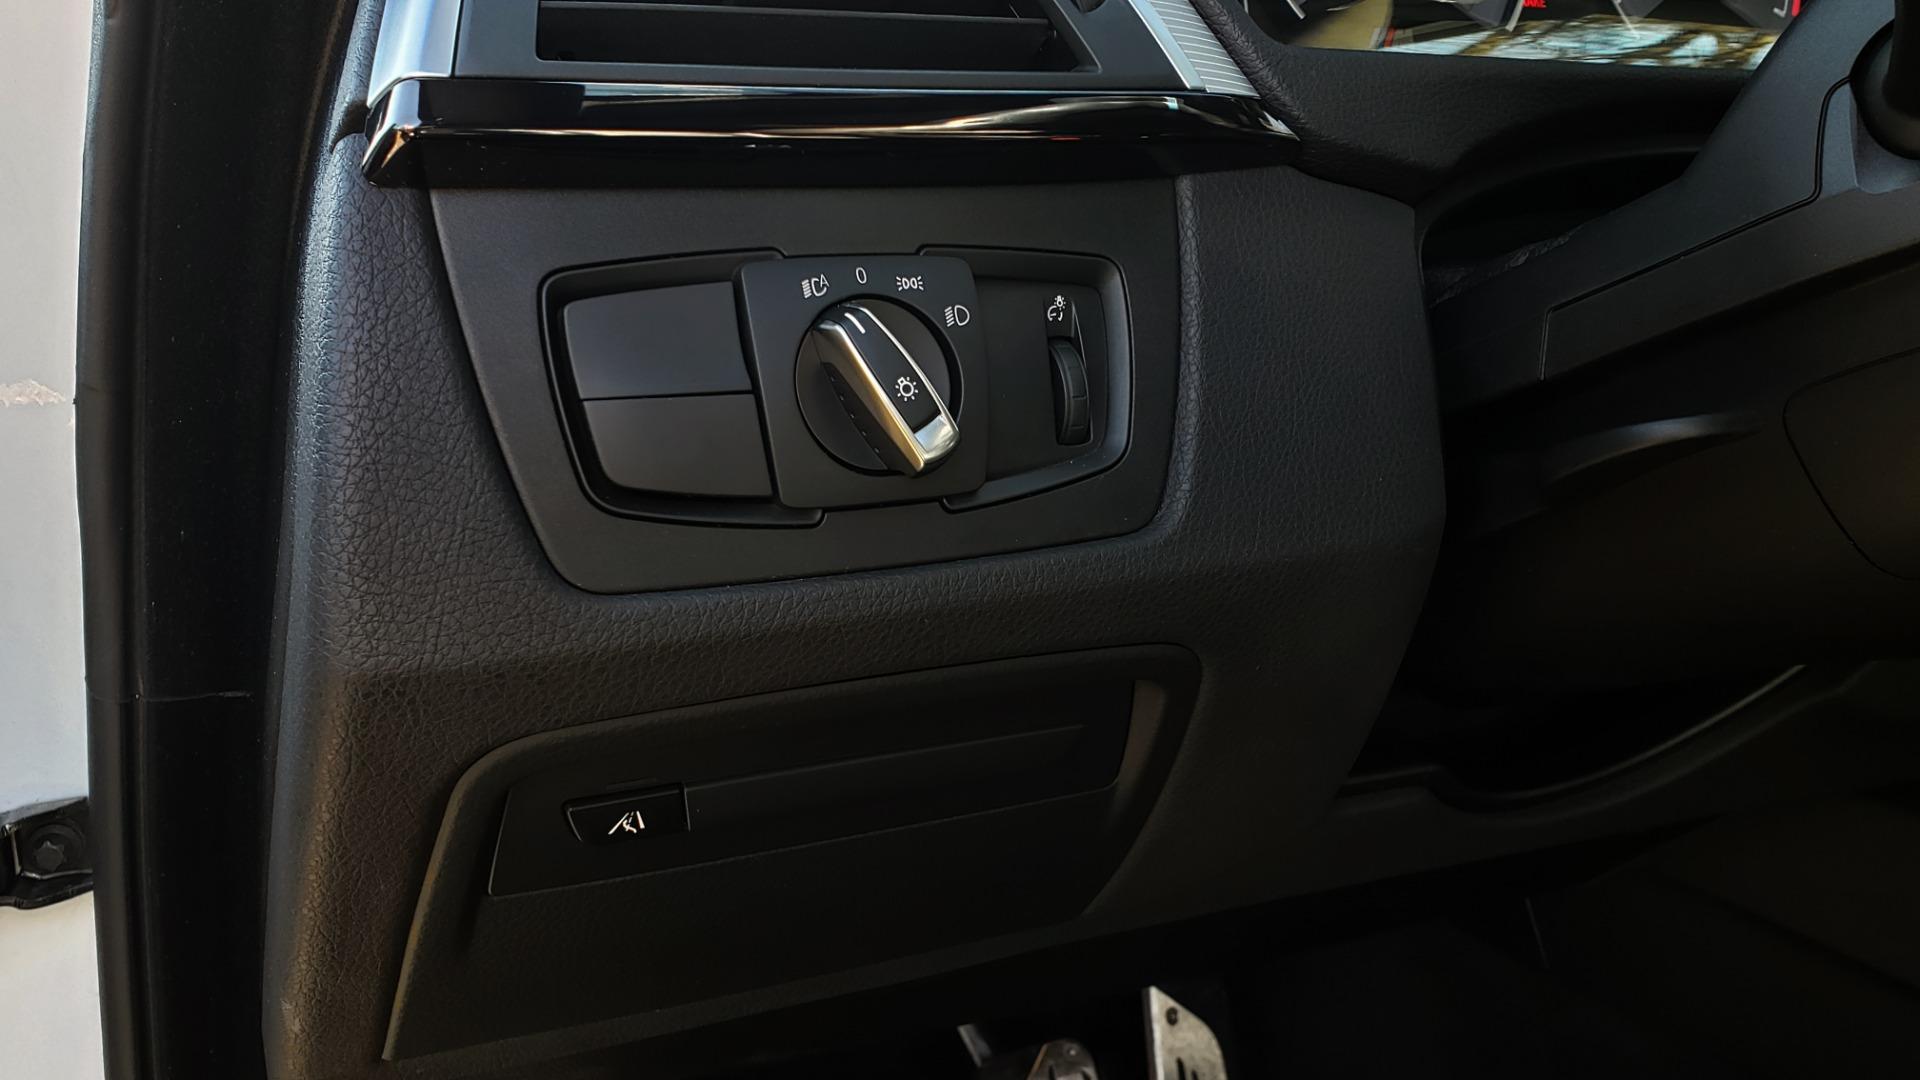 Used 2018 BMW M4 COMP PKG / EXEC / M-DRIVER / PARK CNTRL / ACTIVE BLIND SPOT for sale Sold at Formula Imports in Charlotte NC 28227 40